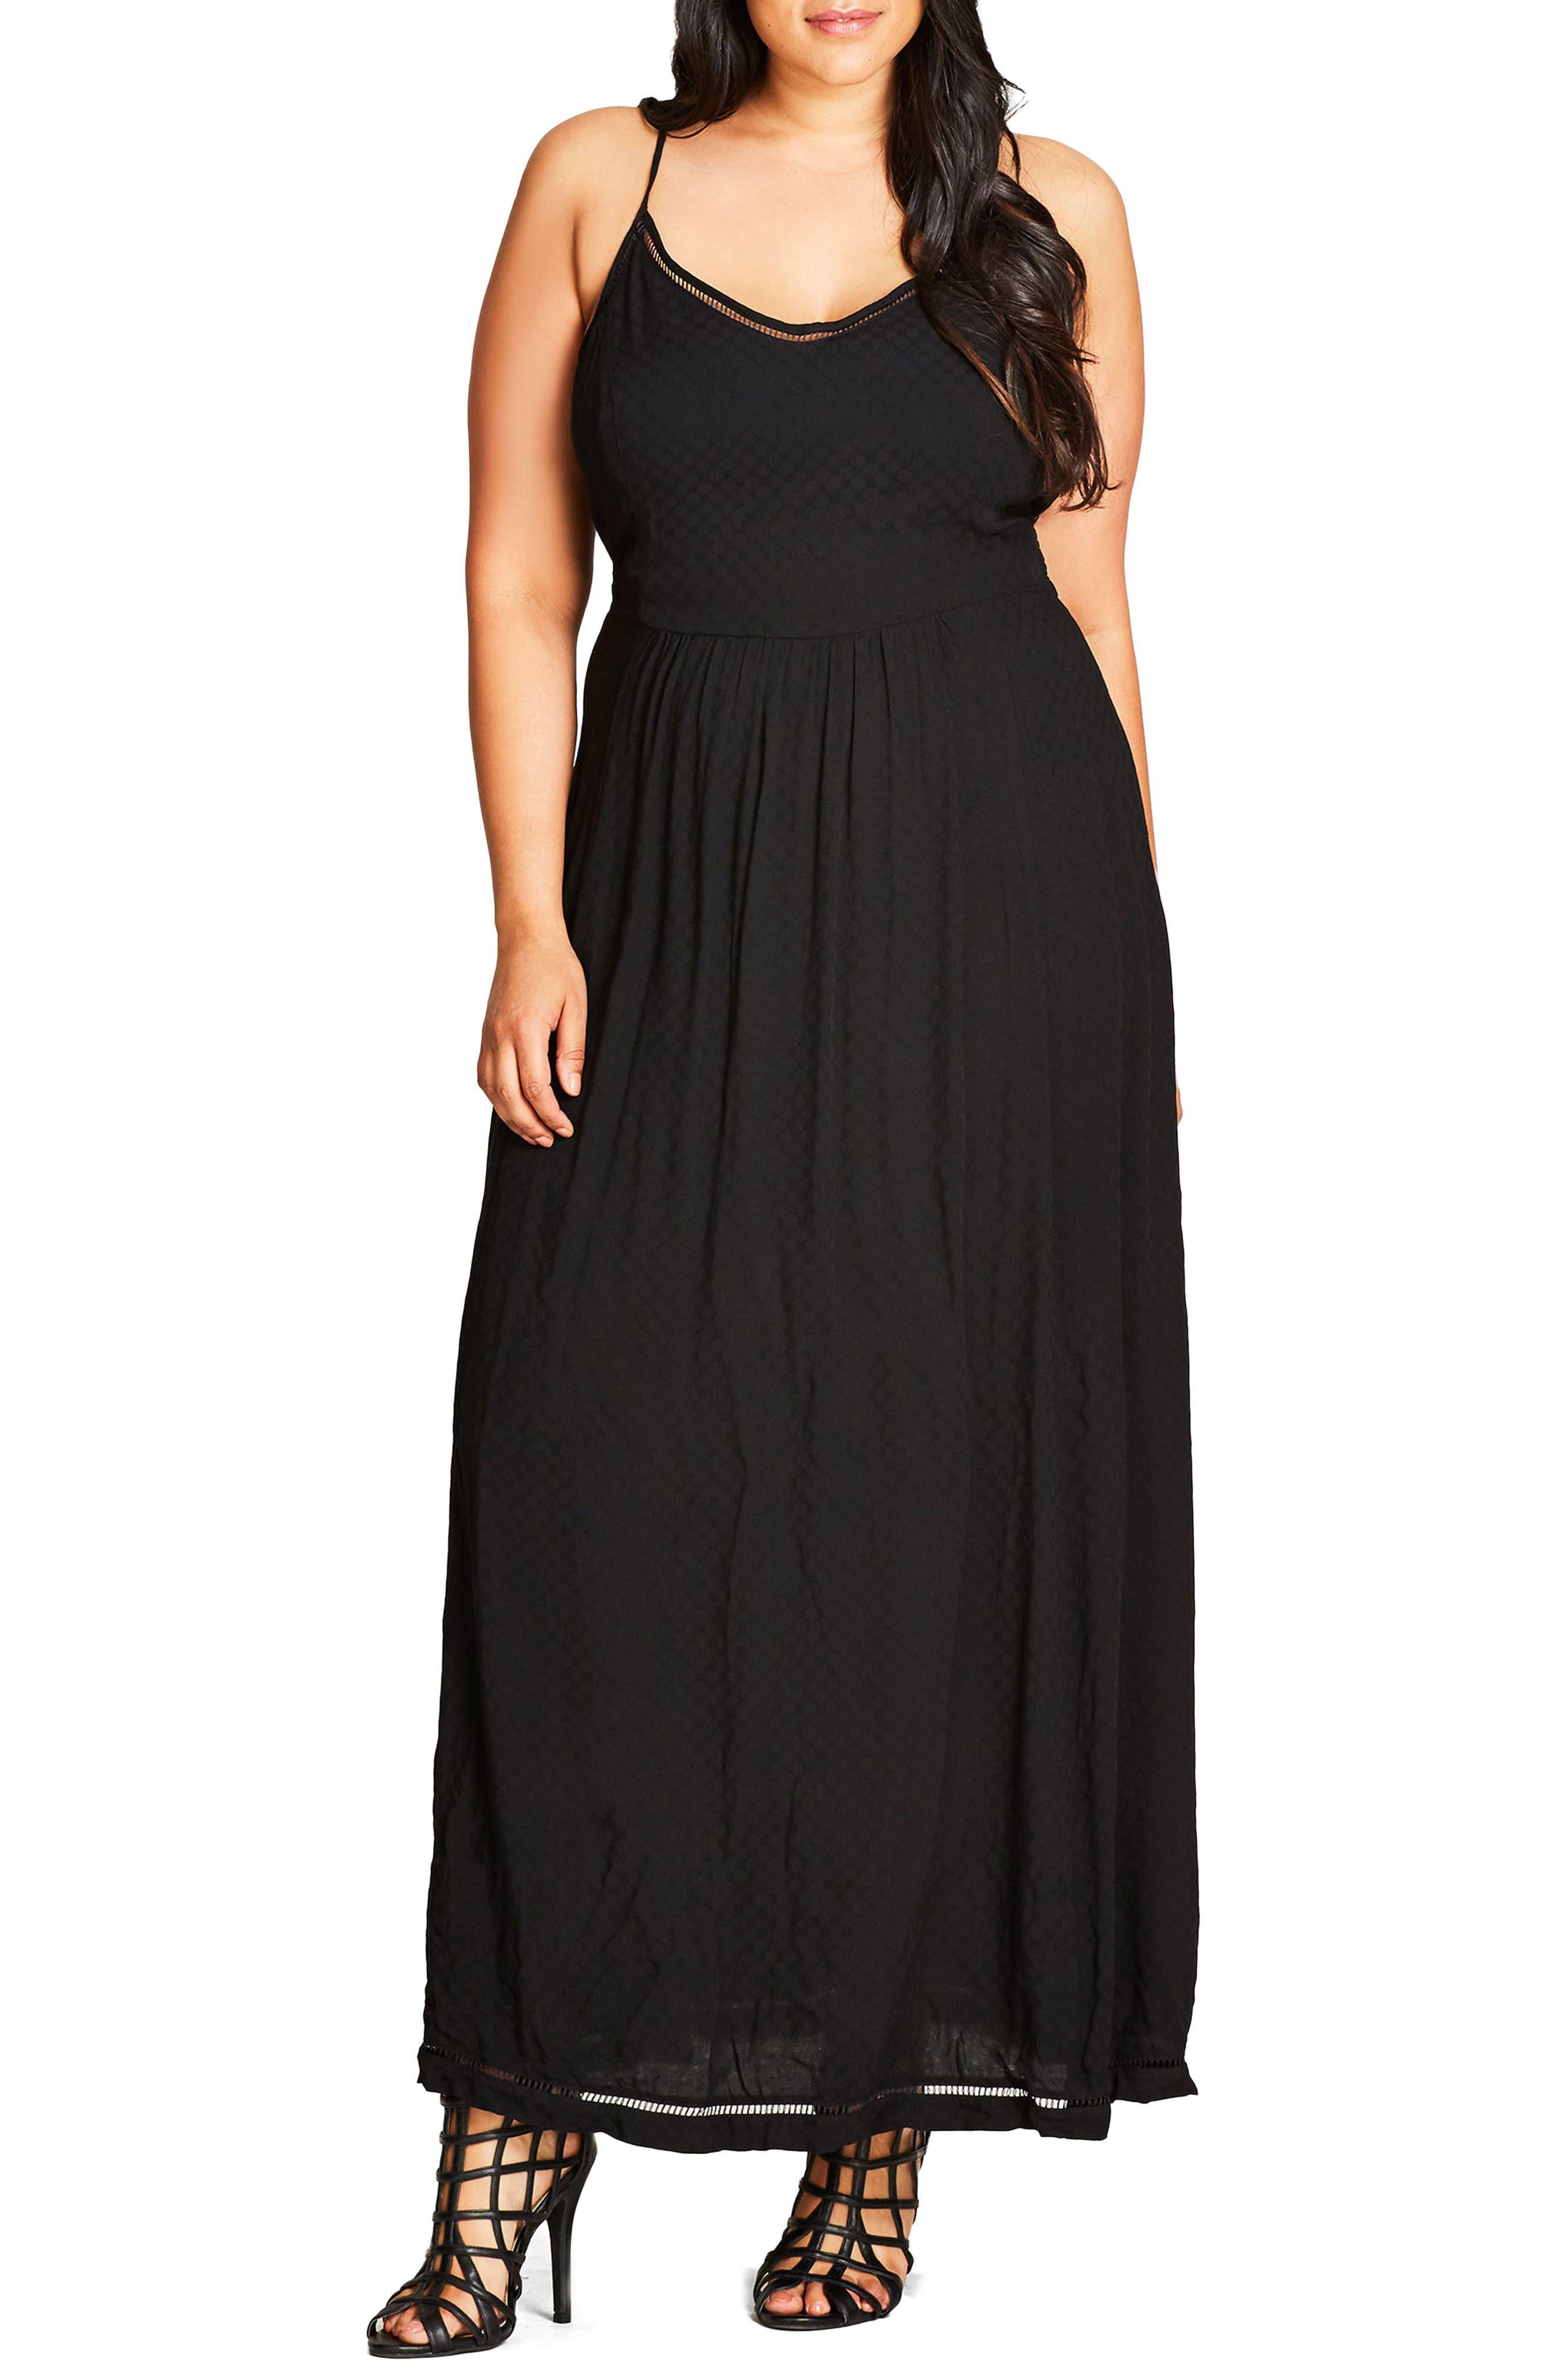 Picnic Party Maxi Dress,                         Main,                         color, Black